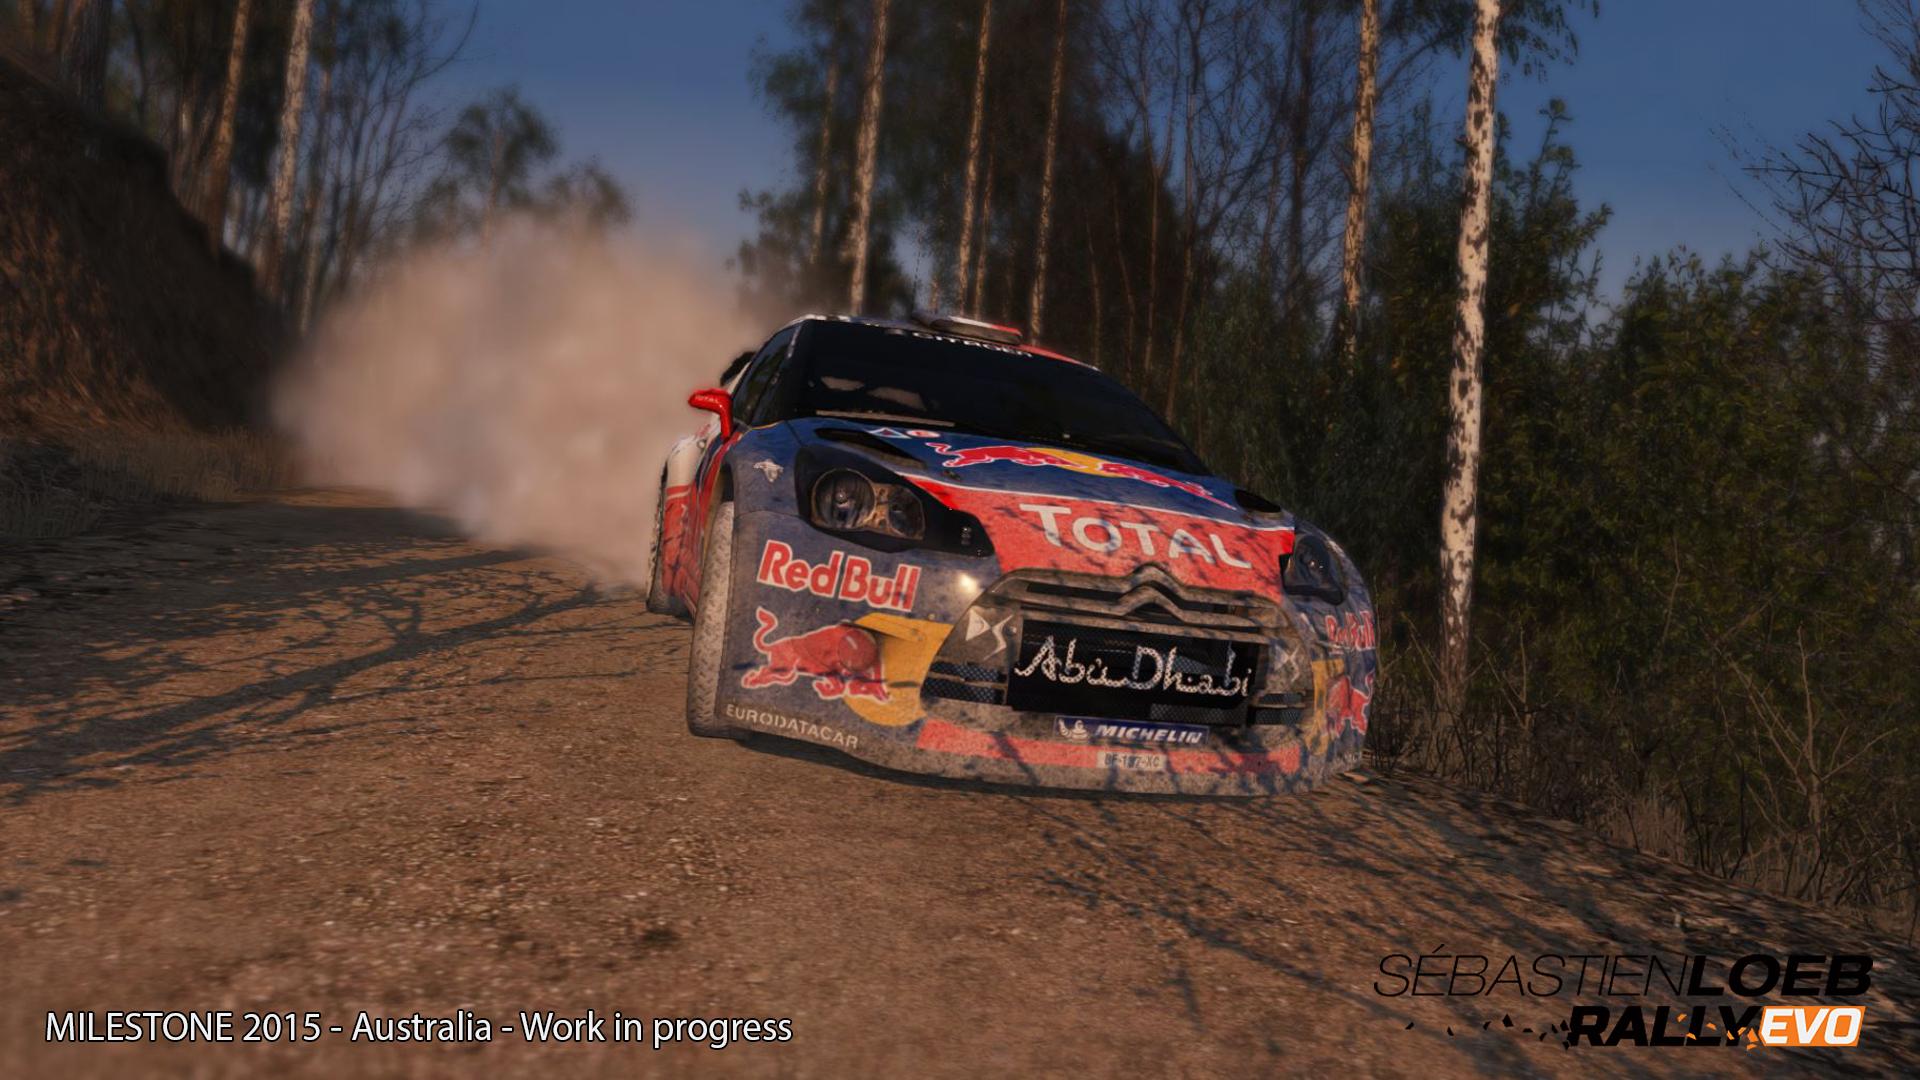 Stunning Sébastien Loeb Rally Evo Australia stage screenshots show fine detail